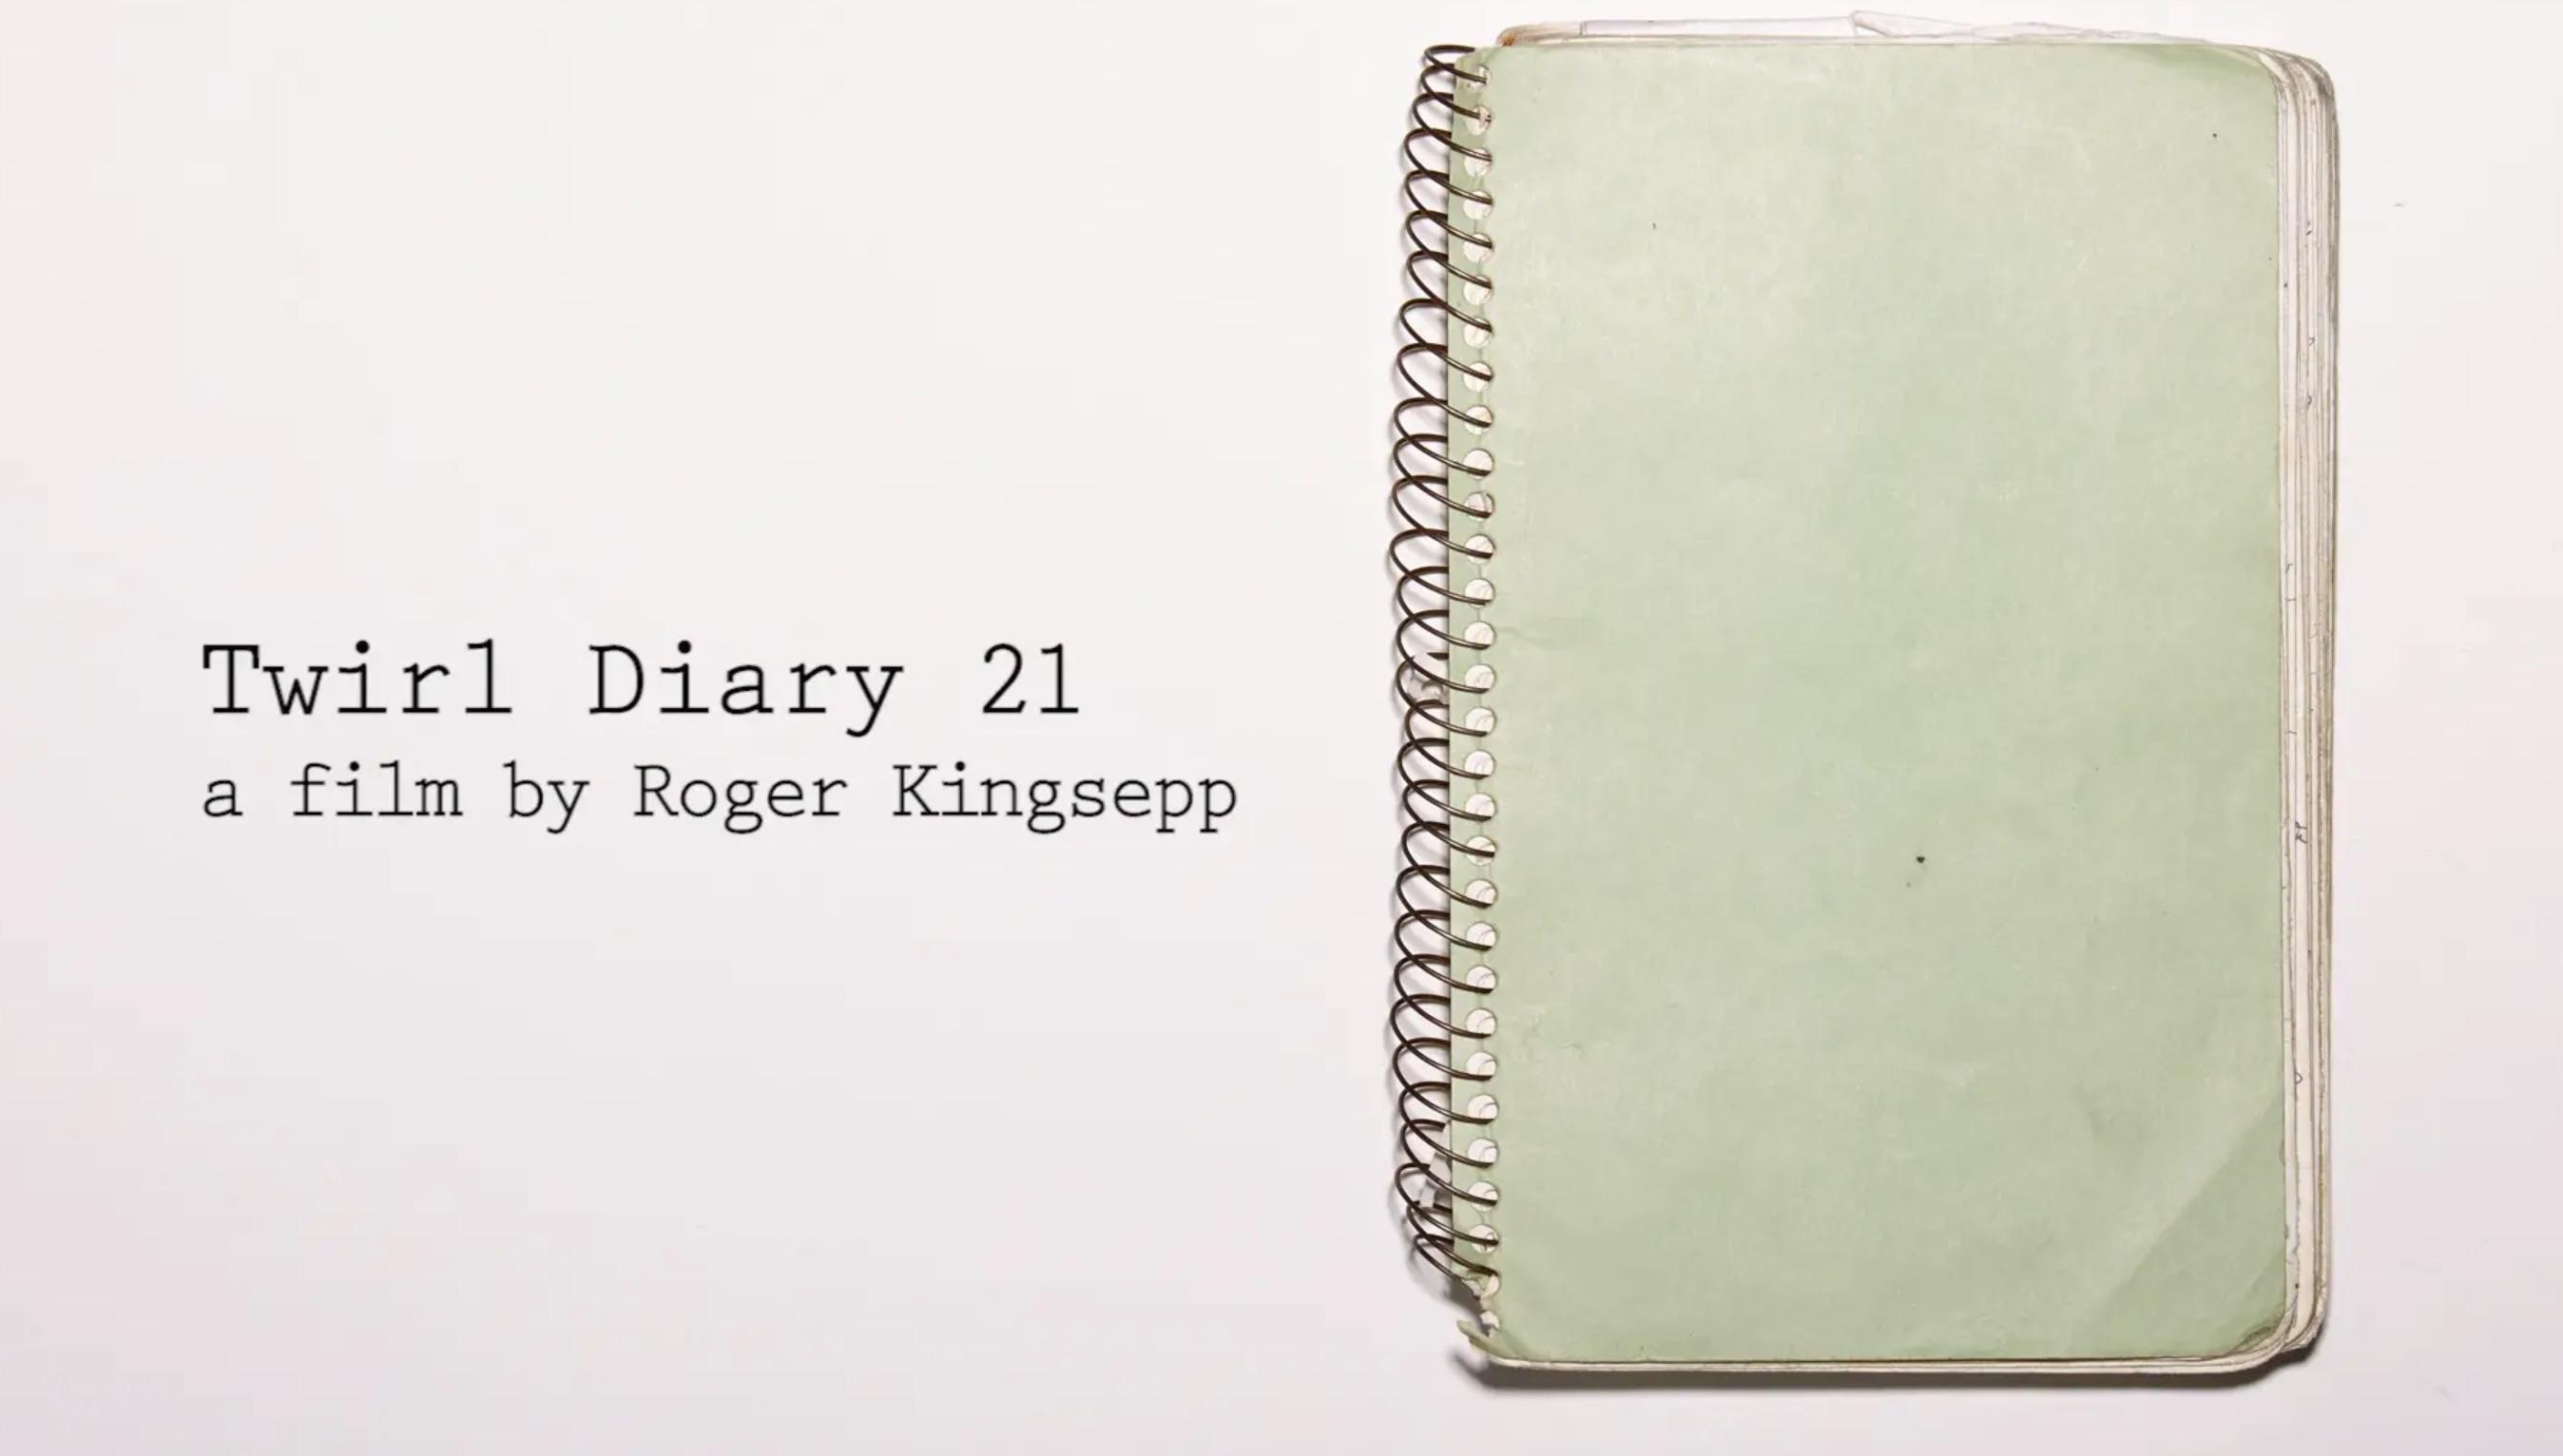 Twirl Diary 21